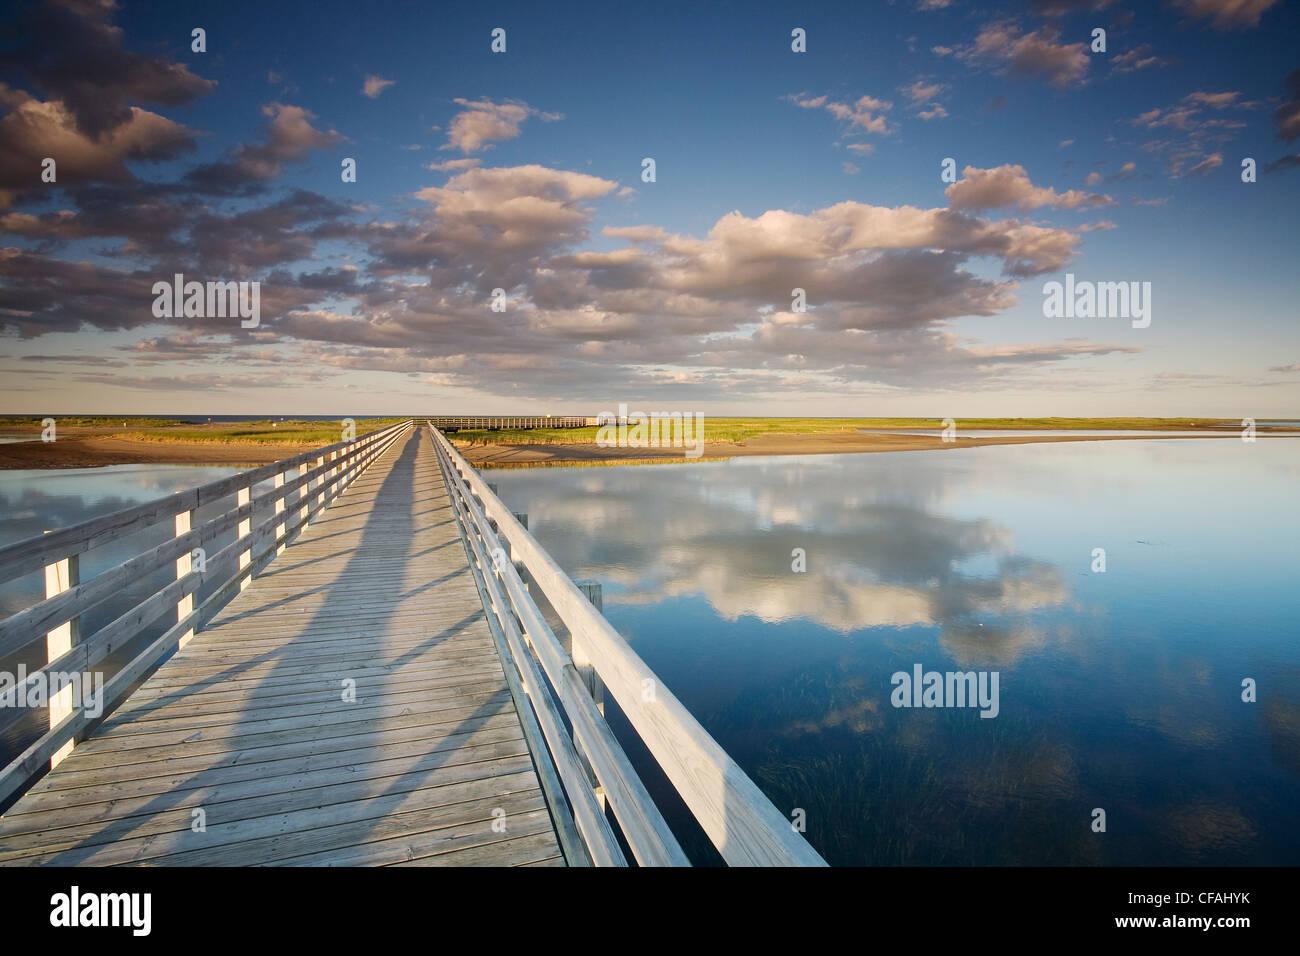 The Kellys beach boardwalk across lagoon beaches Stock Photo